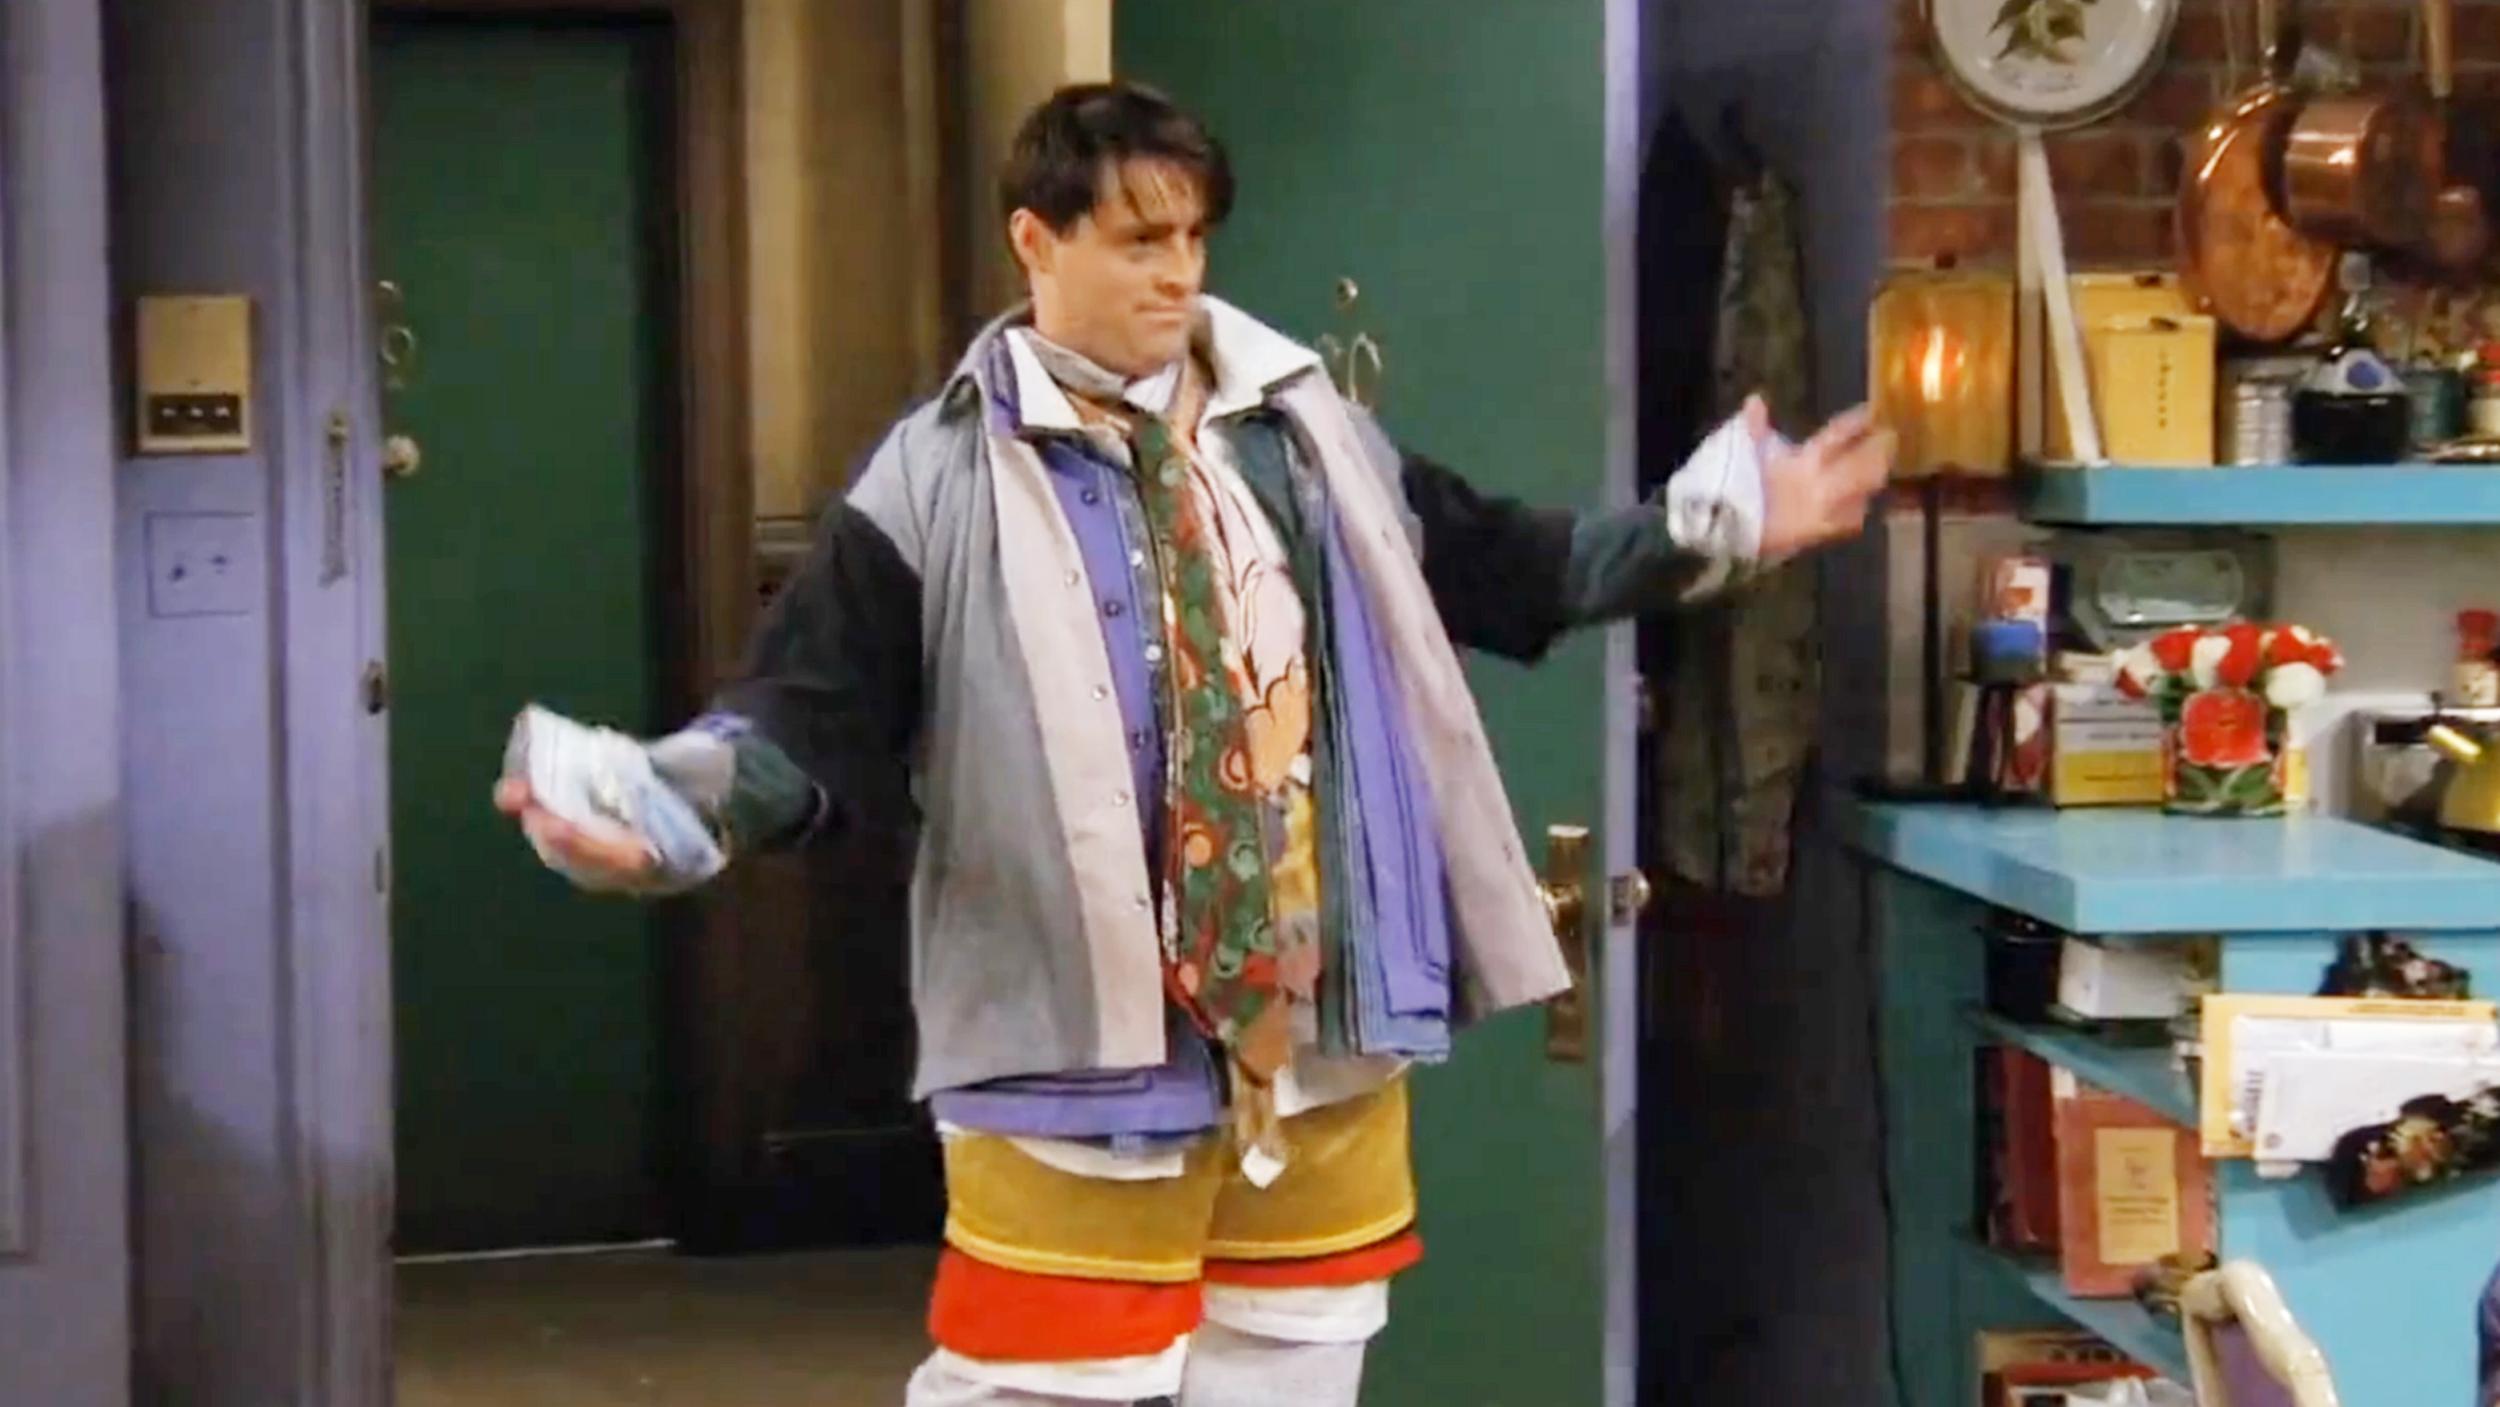 Matt Leblanc Reveals The Friends Episode That Left Him With A Real